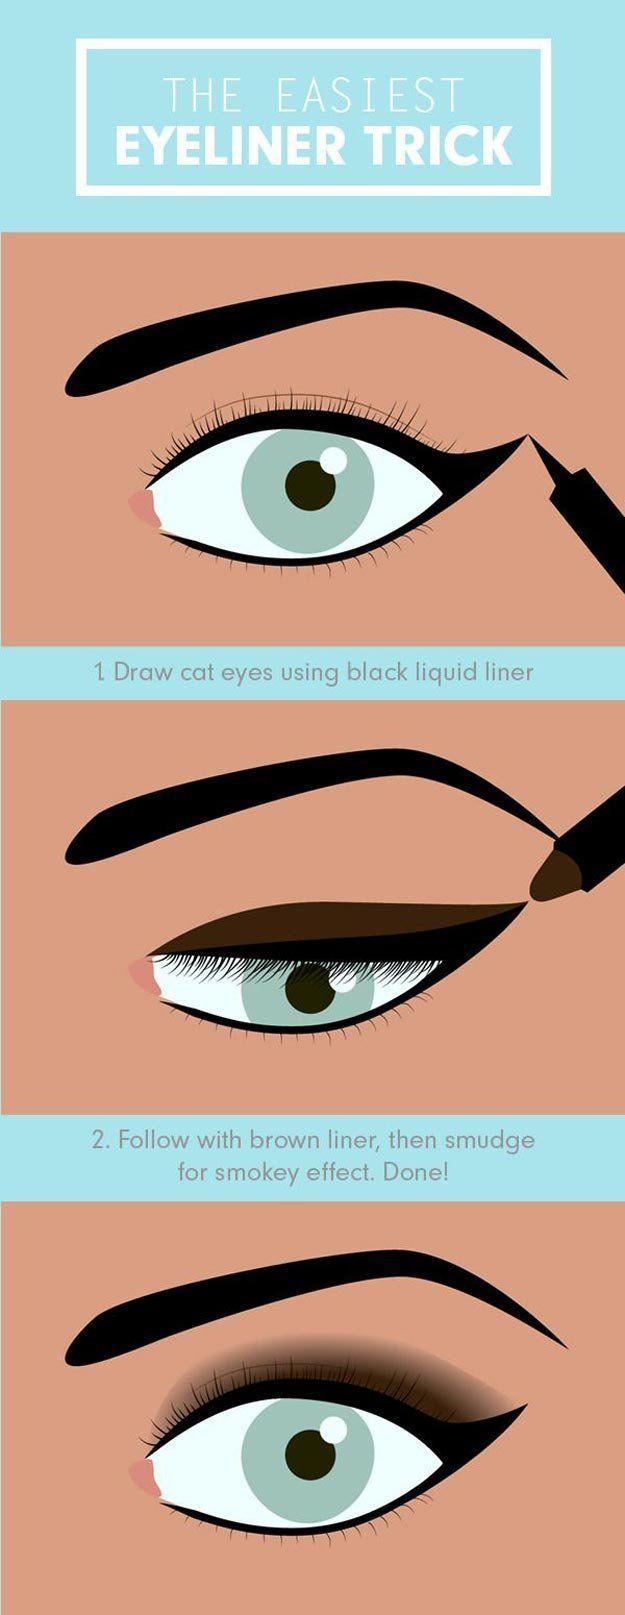 Great Eyeliner Tips For Makeup Junkies